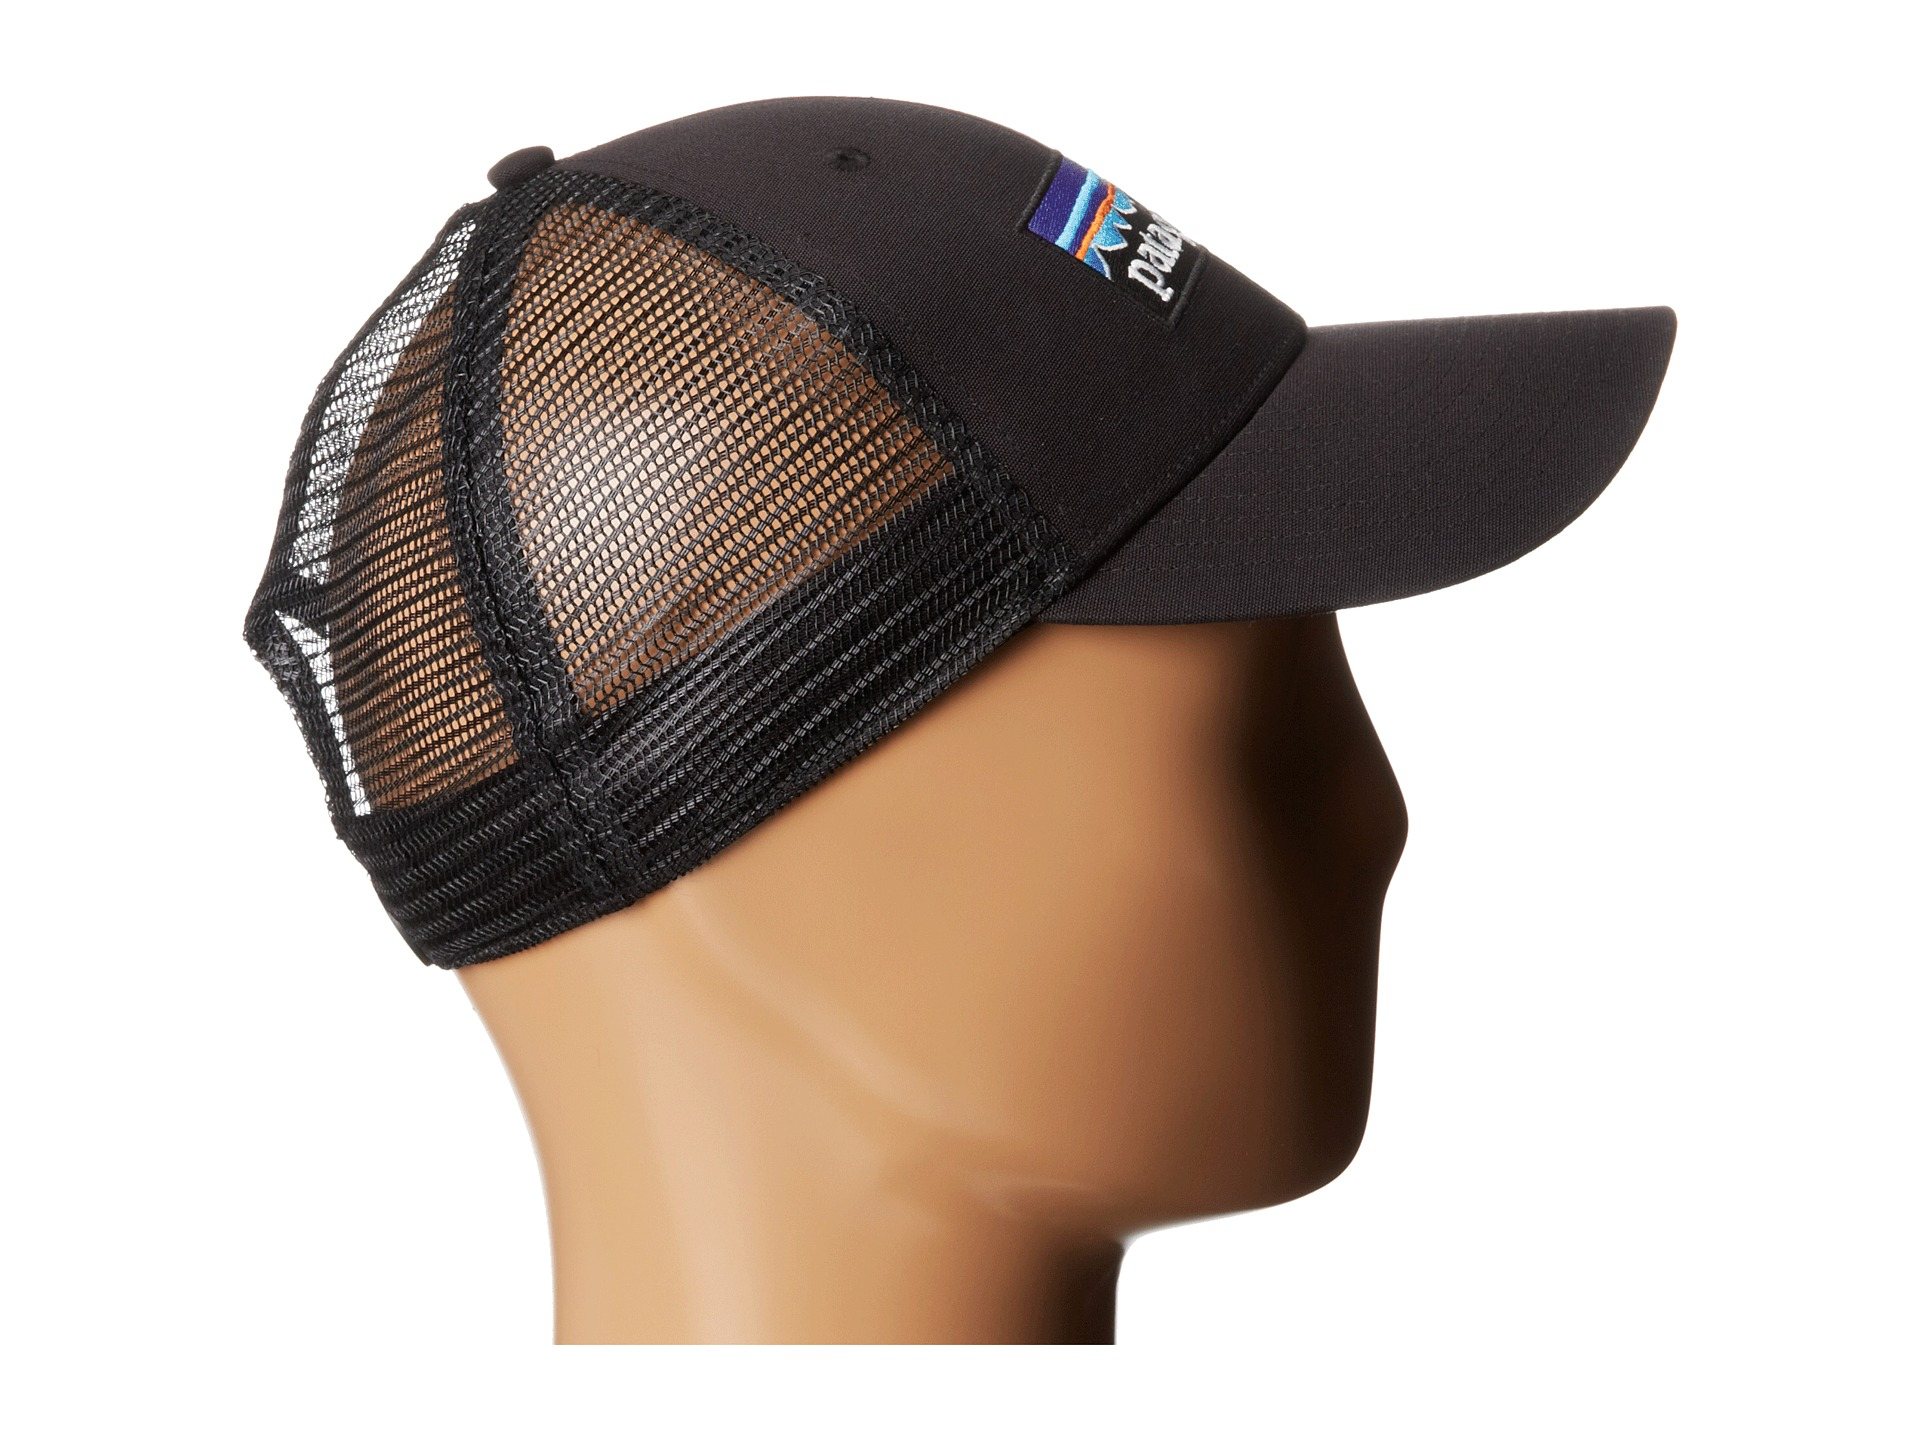 Lyst - Patagonia P6 Lopro Trucker Hat in Black 6b30b57cfb2